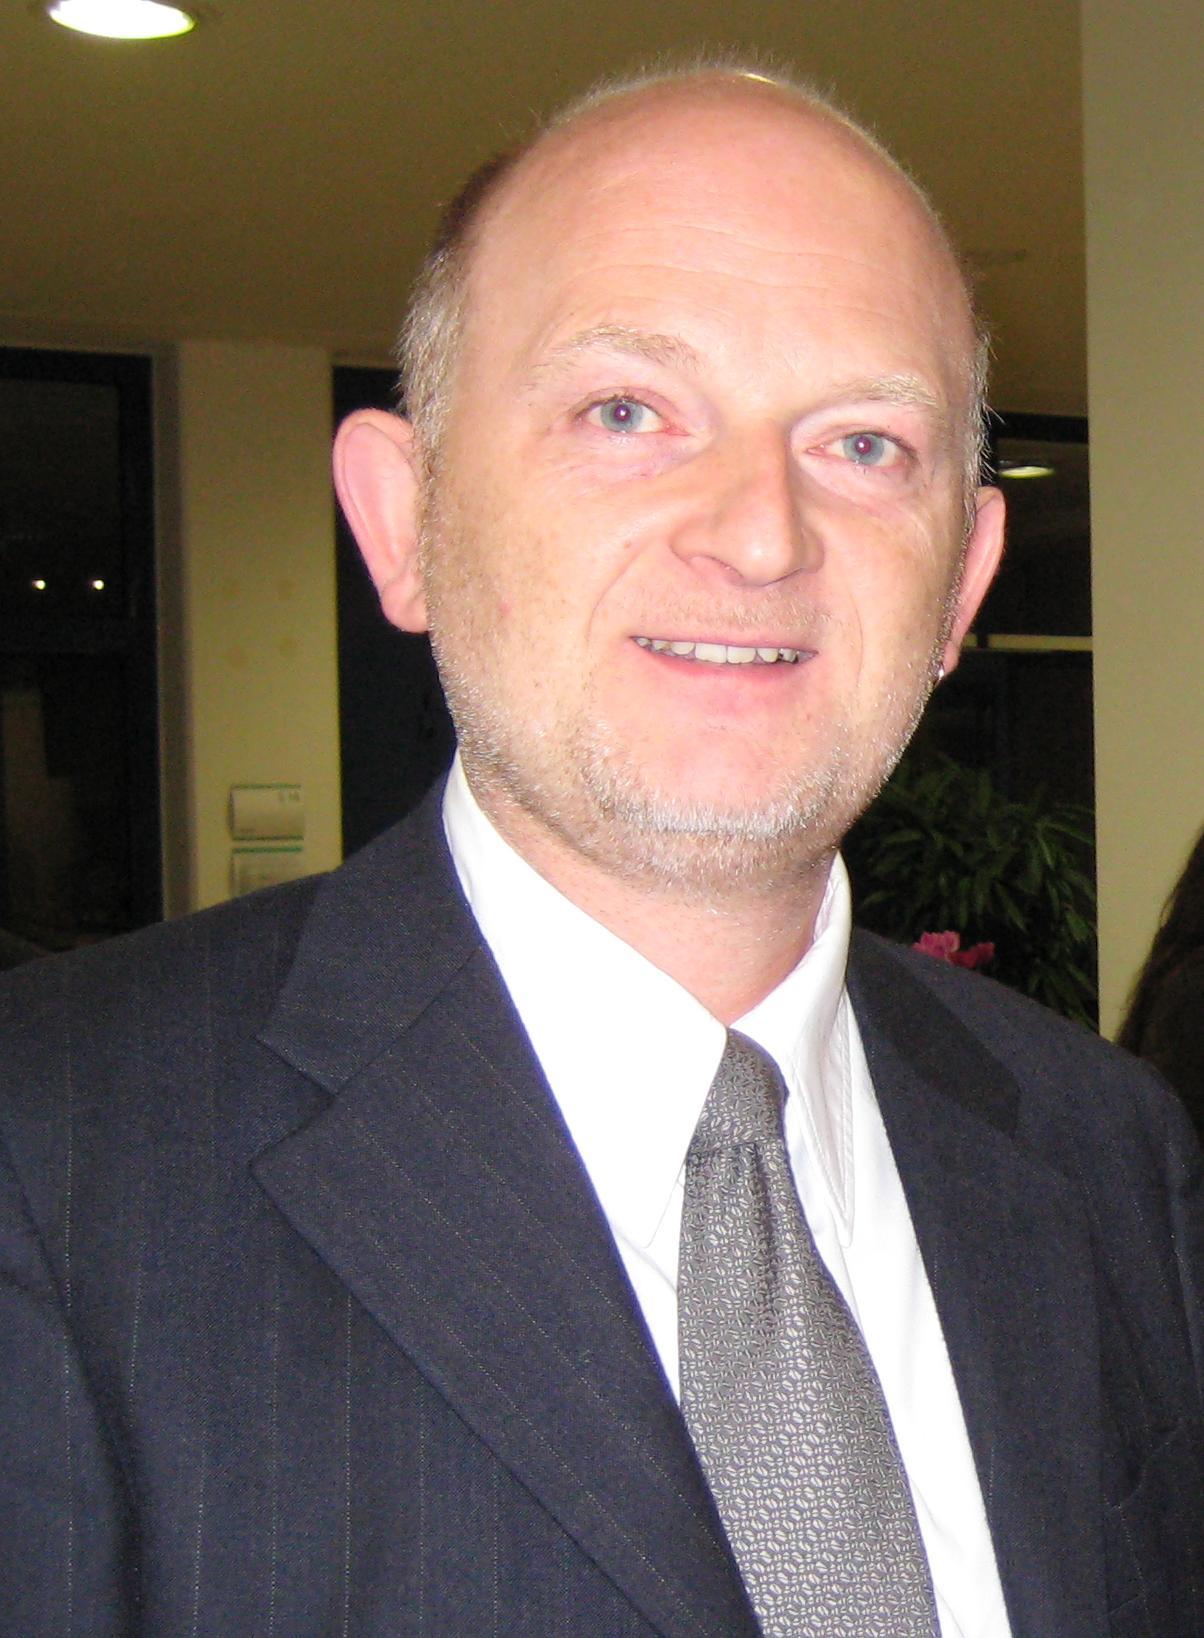 Stephan Richter